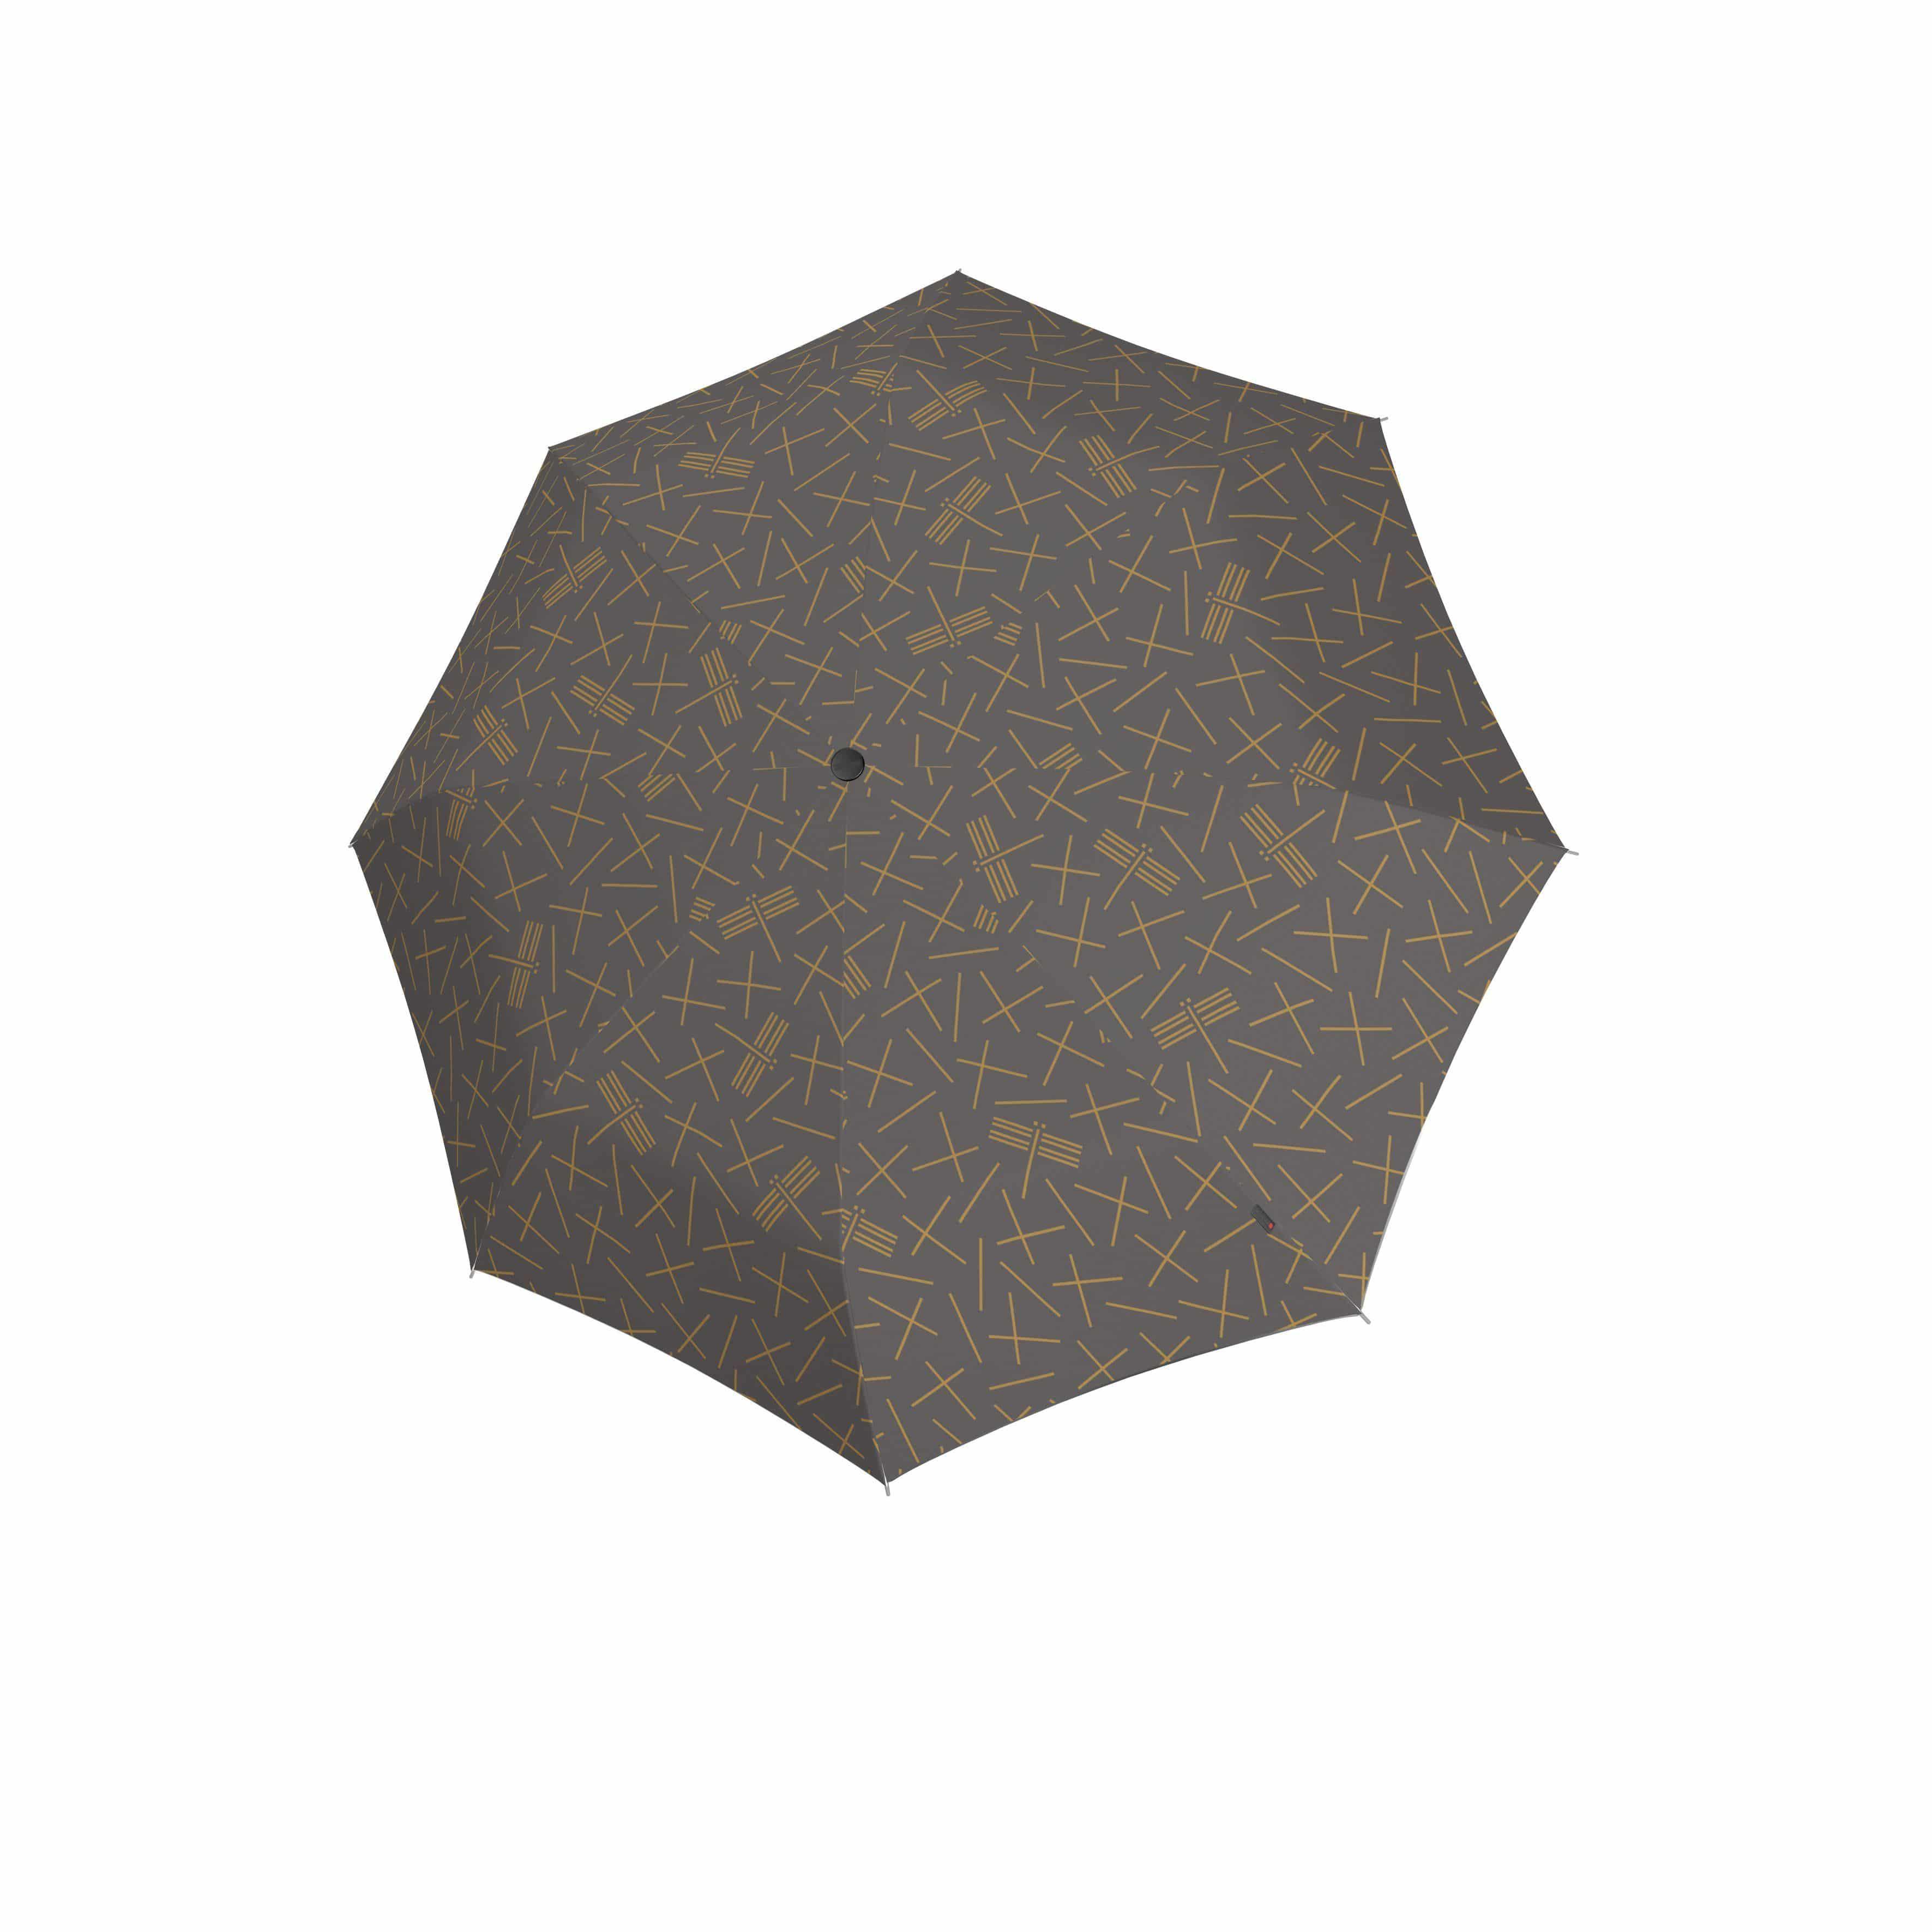 Knirps Umbrella Knirps T.200 medium duomatic NUNO tombo stone ecorepel with UV Protection